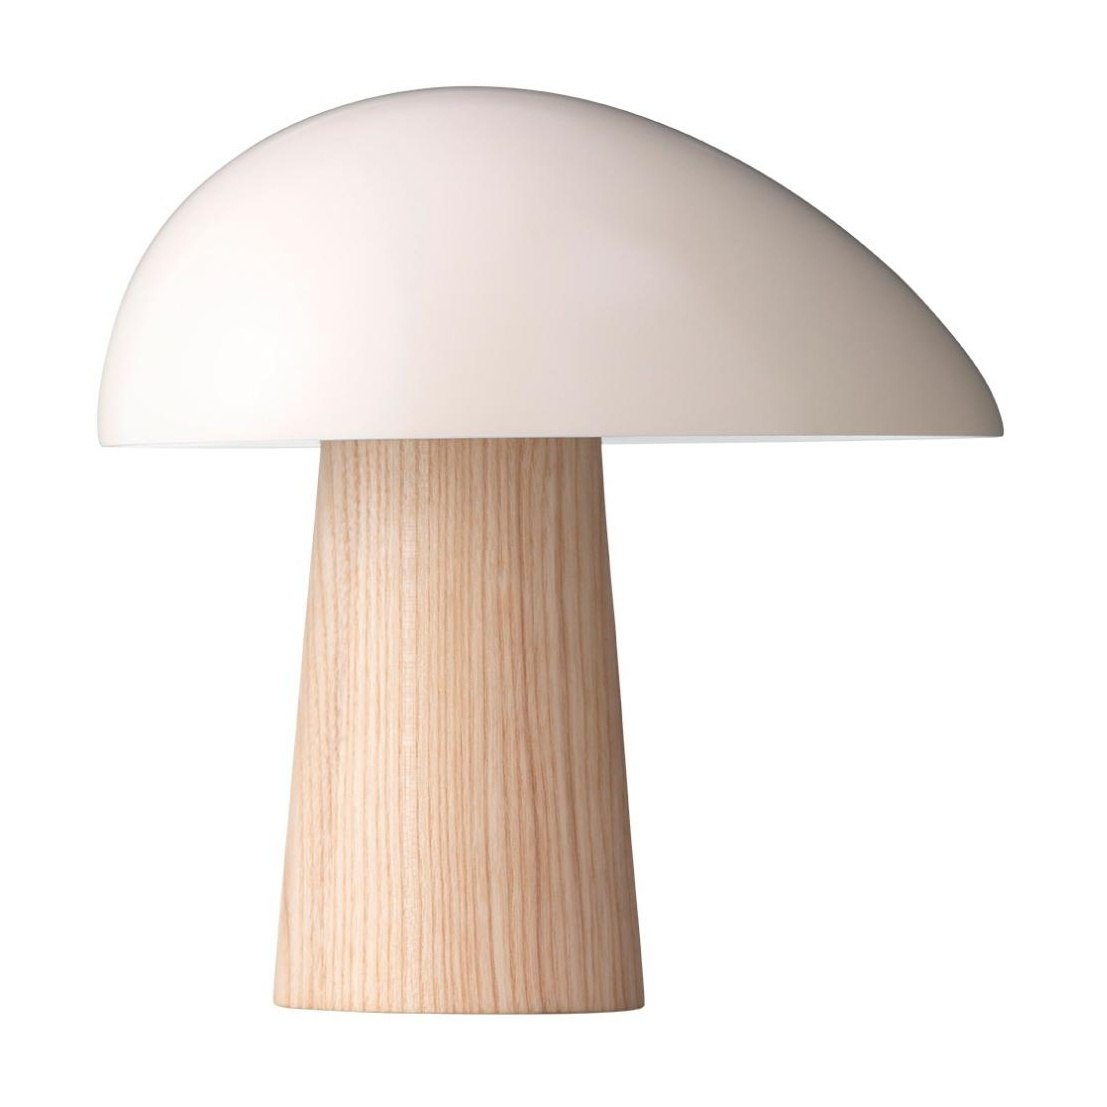 Fritz Hansen - Lampe de table Night Owl™ - blanc fumée/frêne/laqué/H 23,9cm / Ø 23,5cm/câble noir